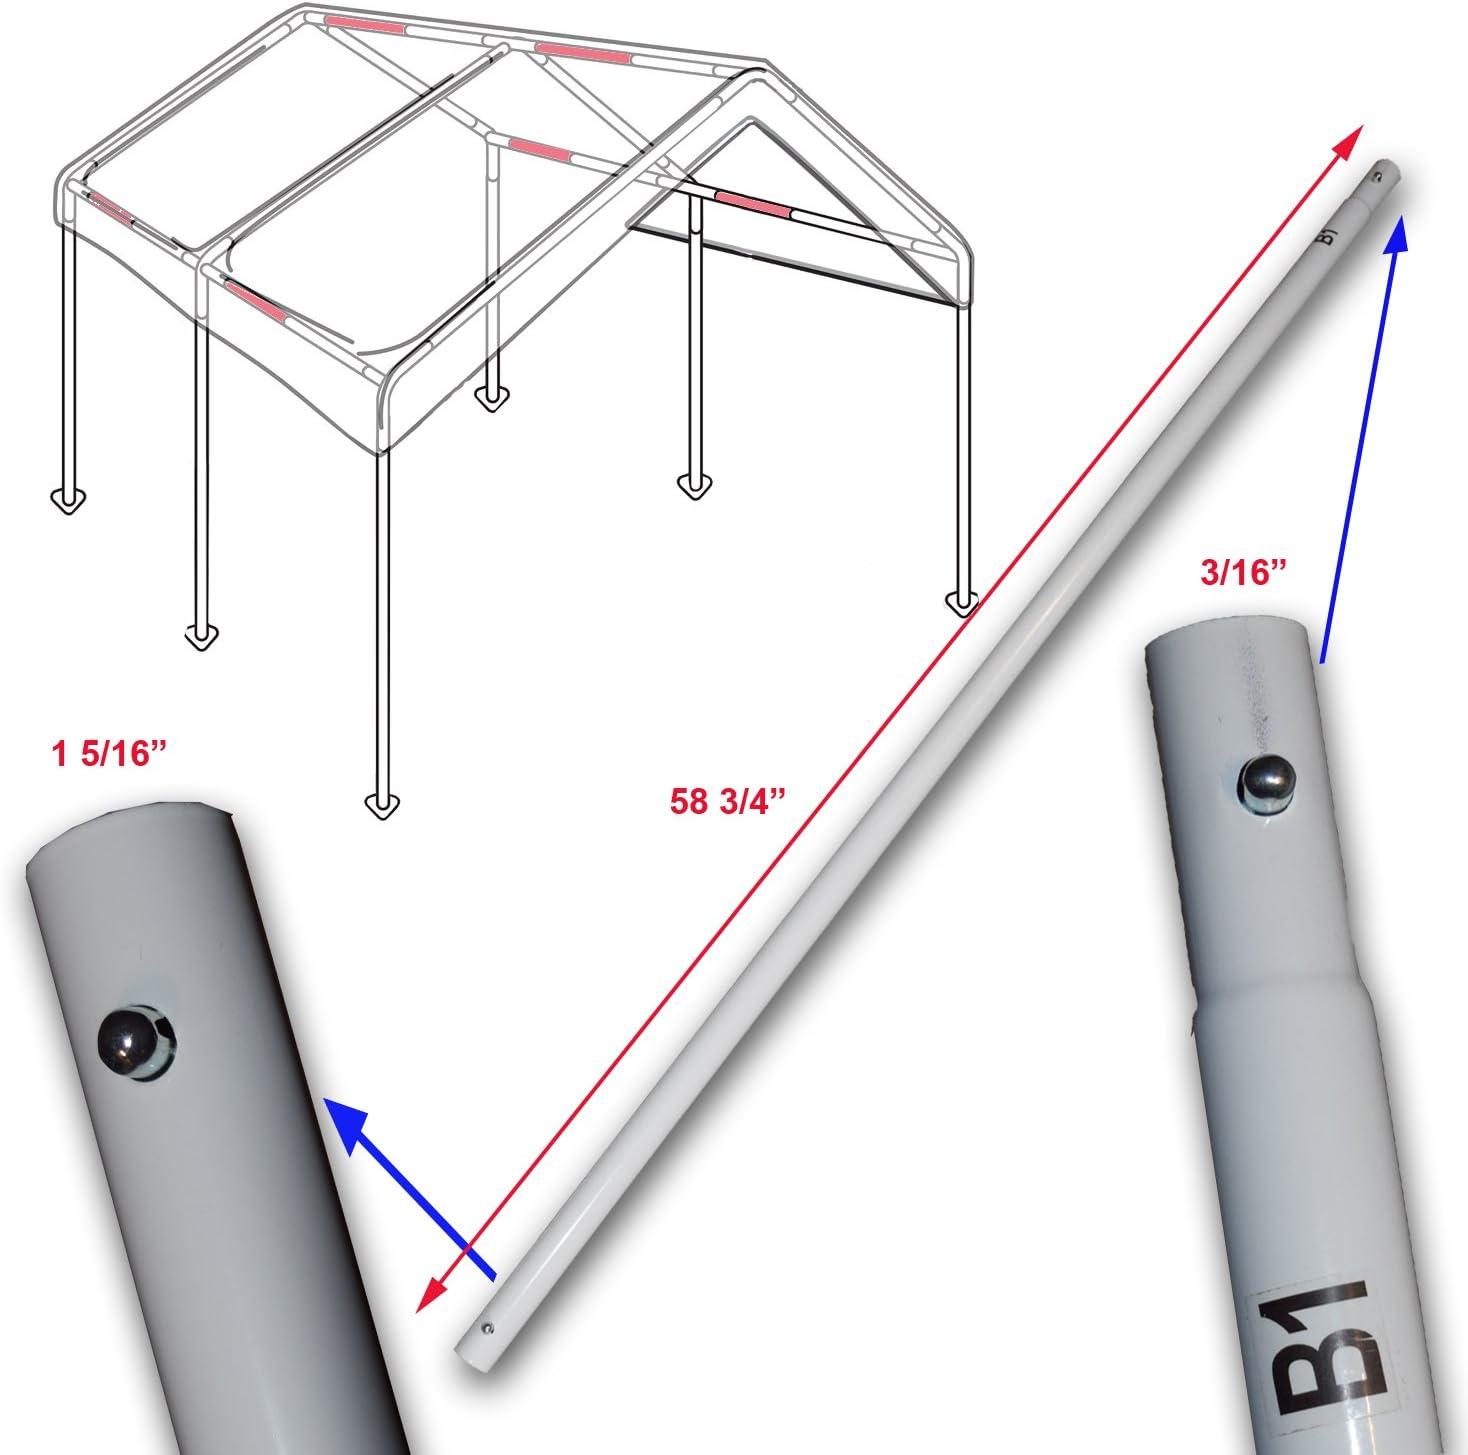 Yard Color Cross Brace Pole 58 3 4 For 10x20 Caravan Canopy Domain Carport Garage Parts B1 Awnings Canopies